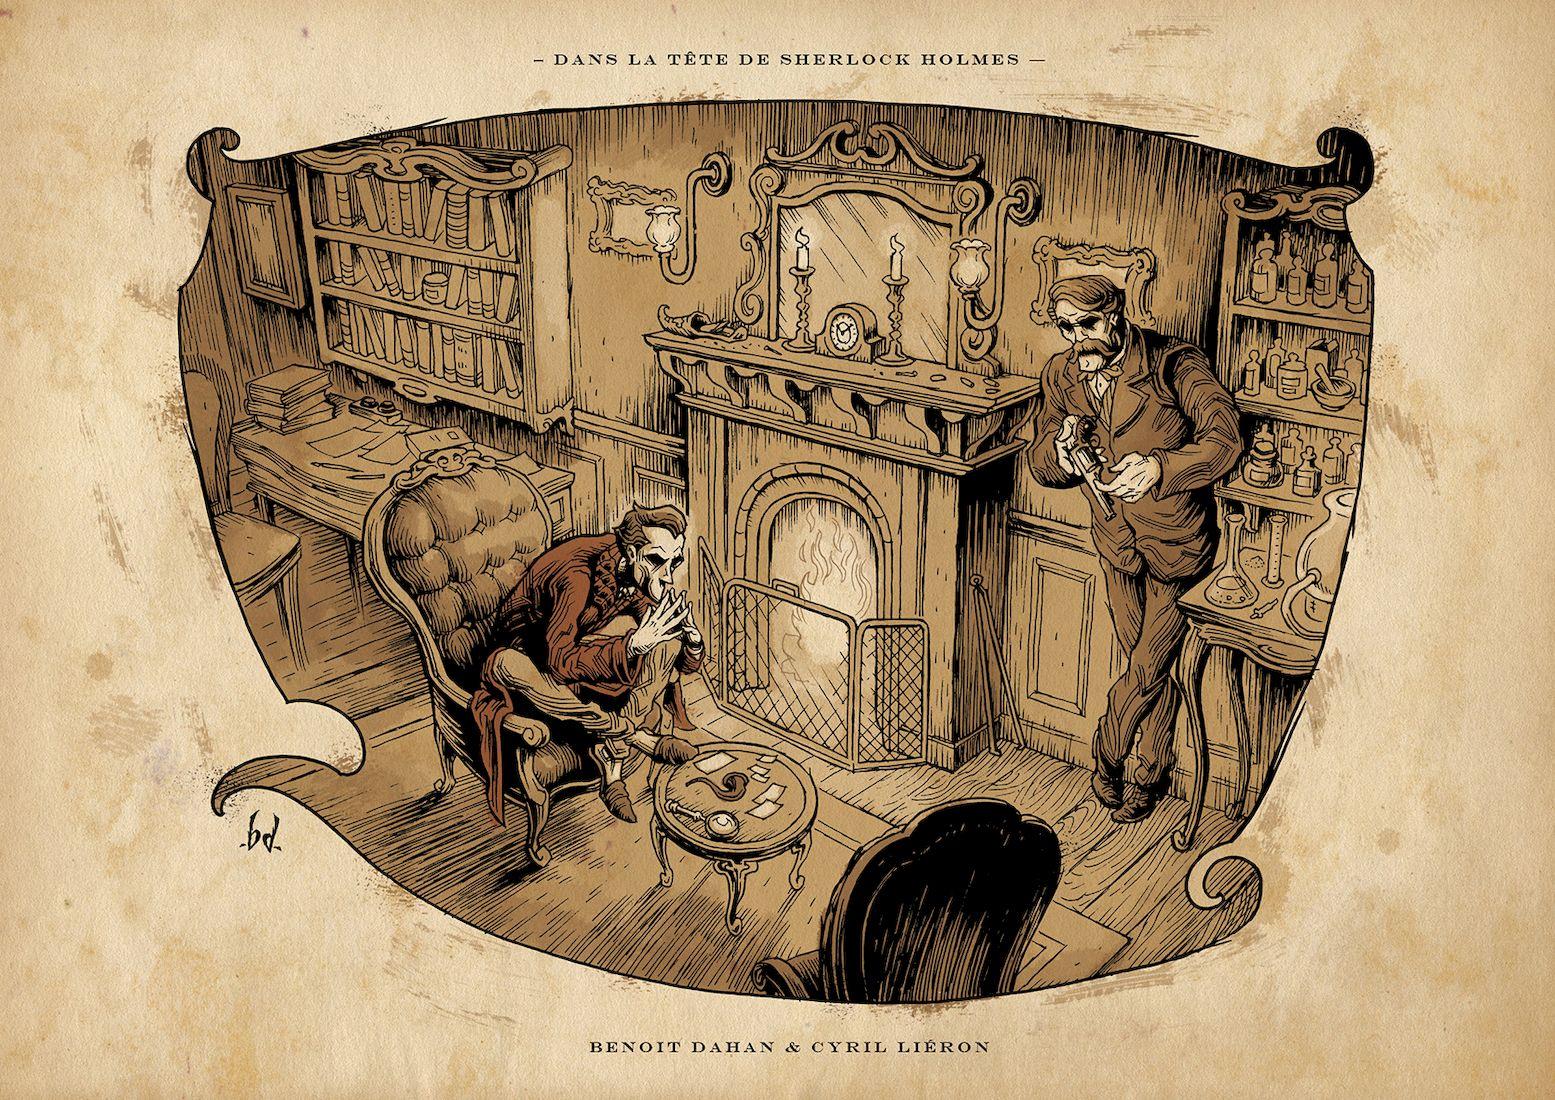 Dans la tête de Sherlock Holmes, ex libris  © Ankama / Dahan / Liéron / Dahan